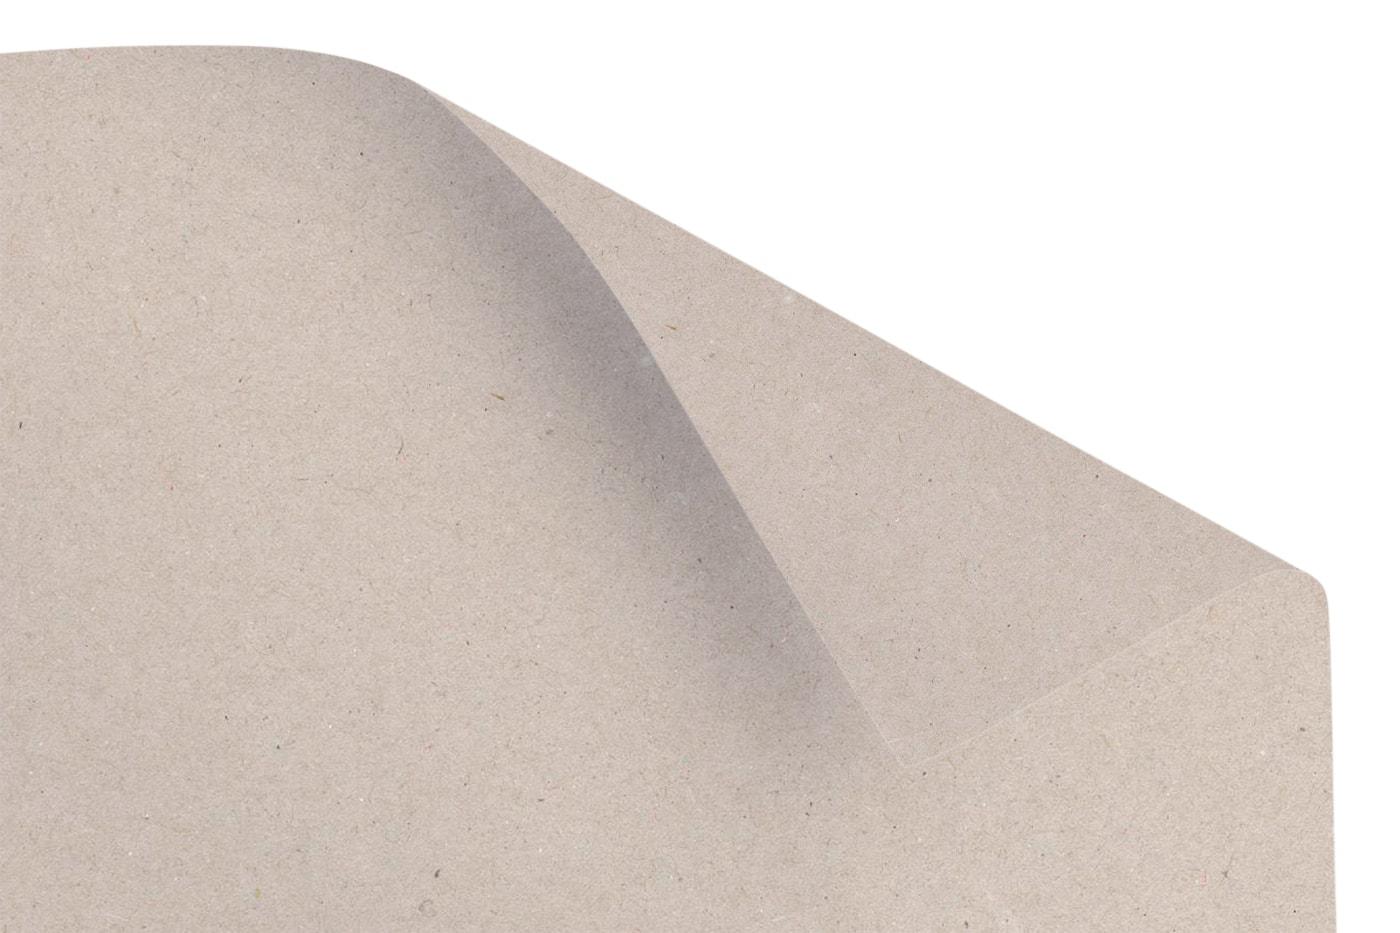 Schablonenkarton ca. 2000g/m², Dicke ca. 2,0mm, 75x100cm